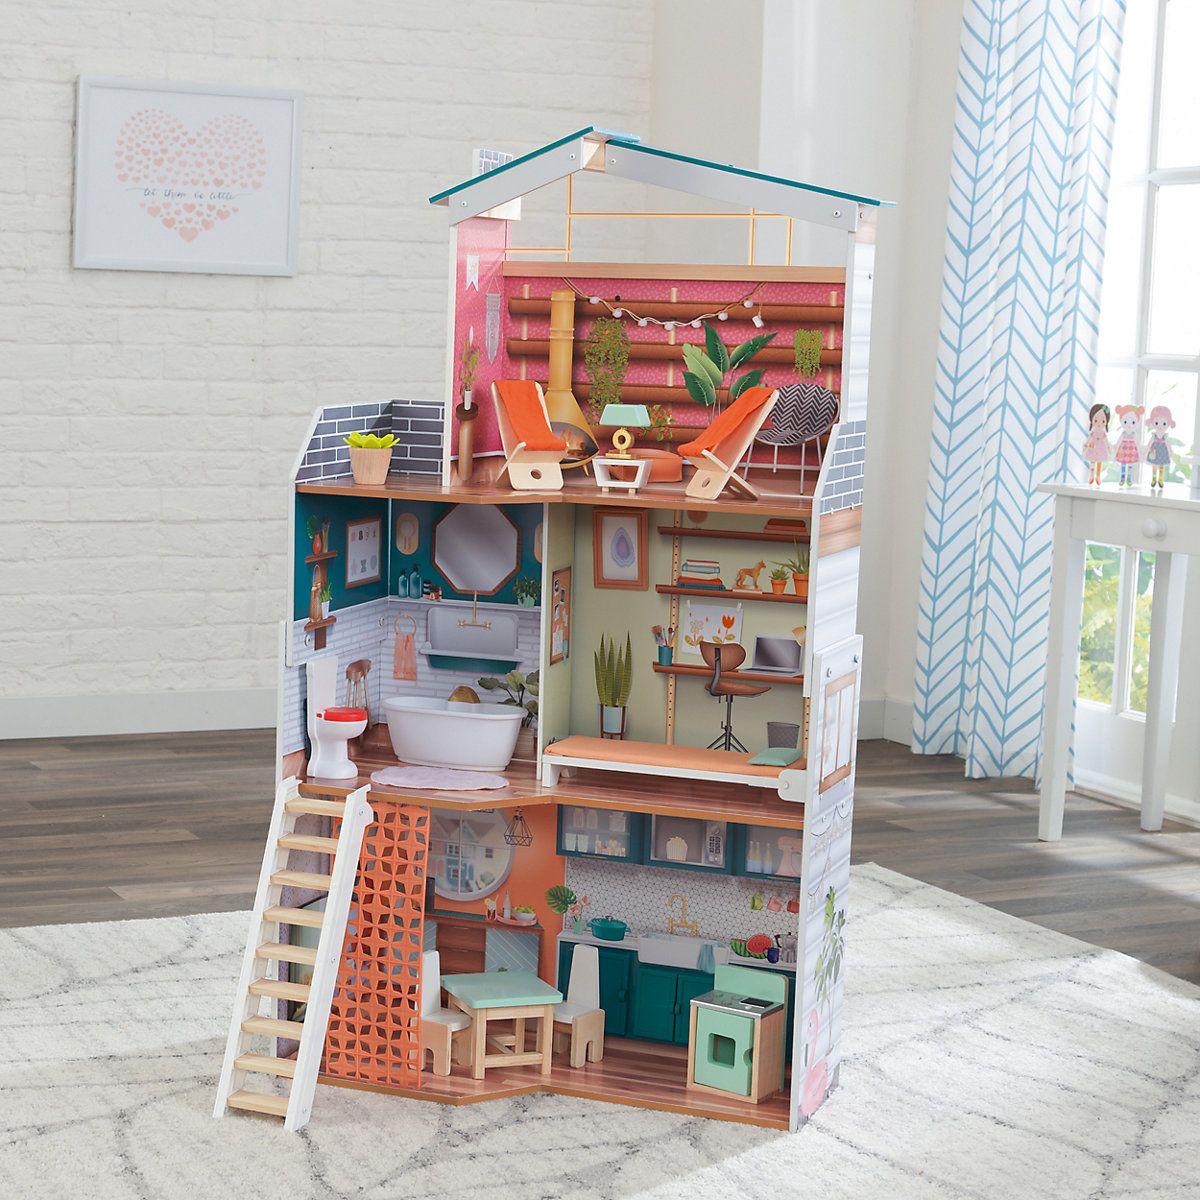 Wood 2 story Barbie doll house,Dollhouse Kit,DIY kit,Miniature Dollhouse,Toyhouse,No Furniture,montessory toys,natural,waldorf toy,3D puzzle